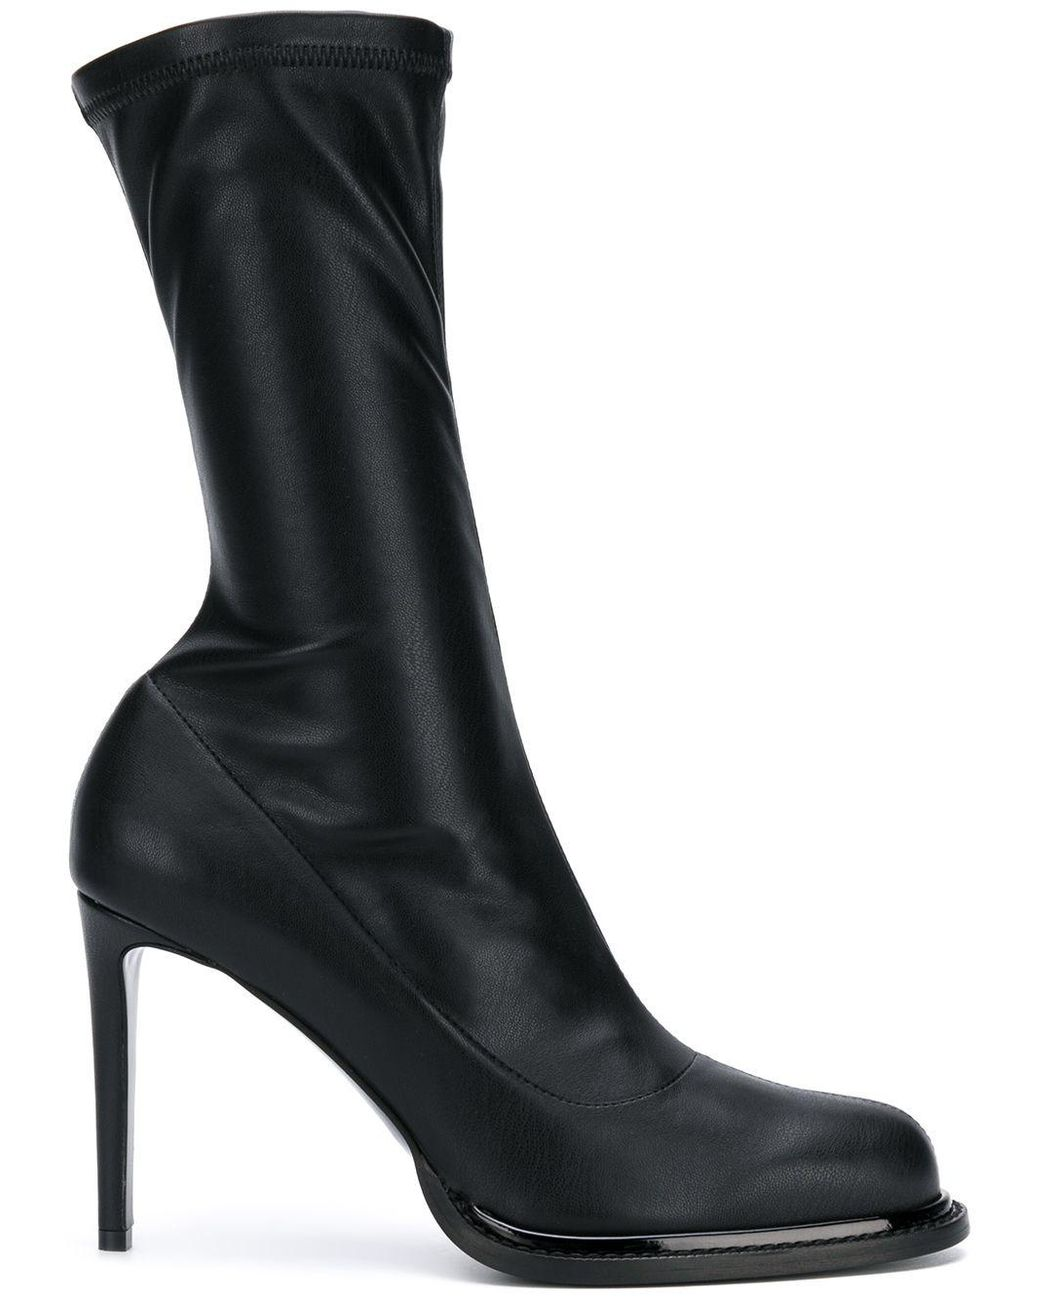 19904b59161 Women's Black Palmer Ankle Boots